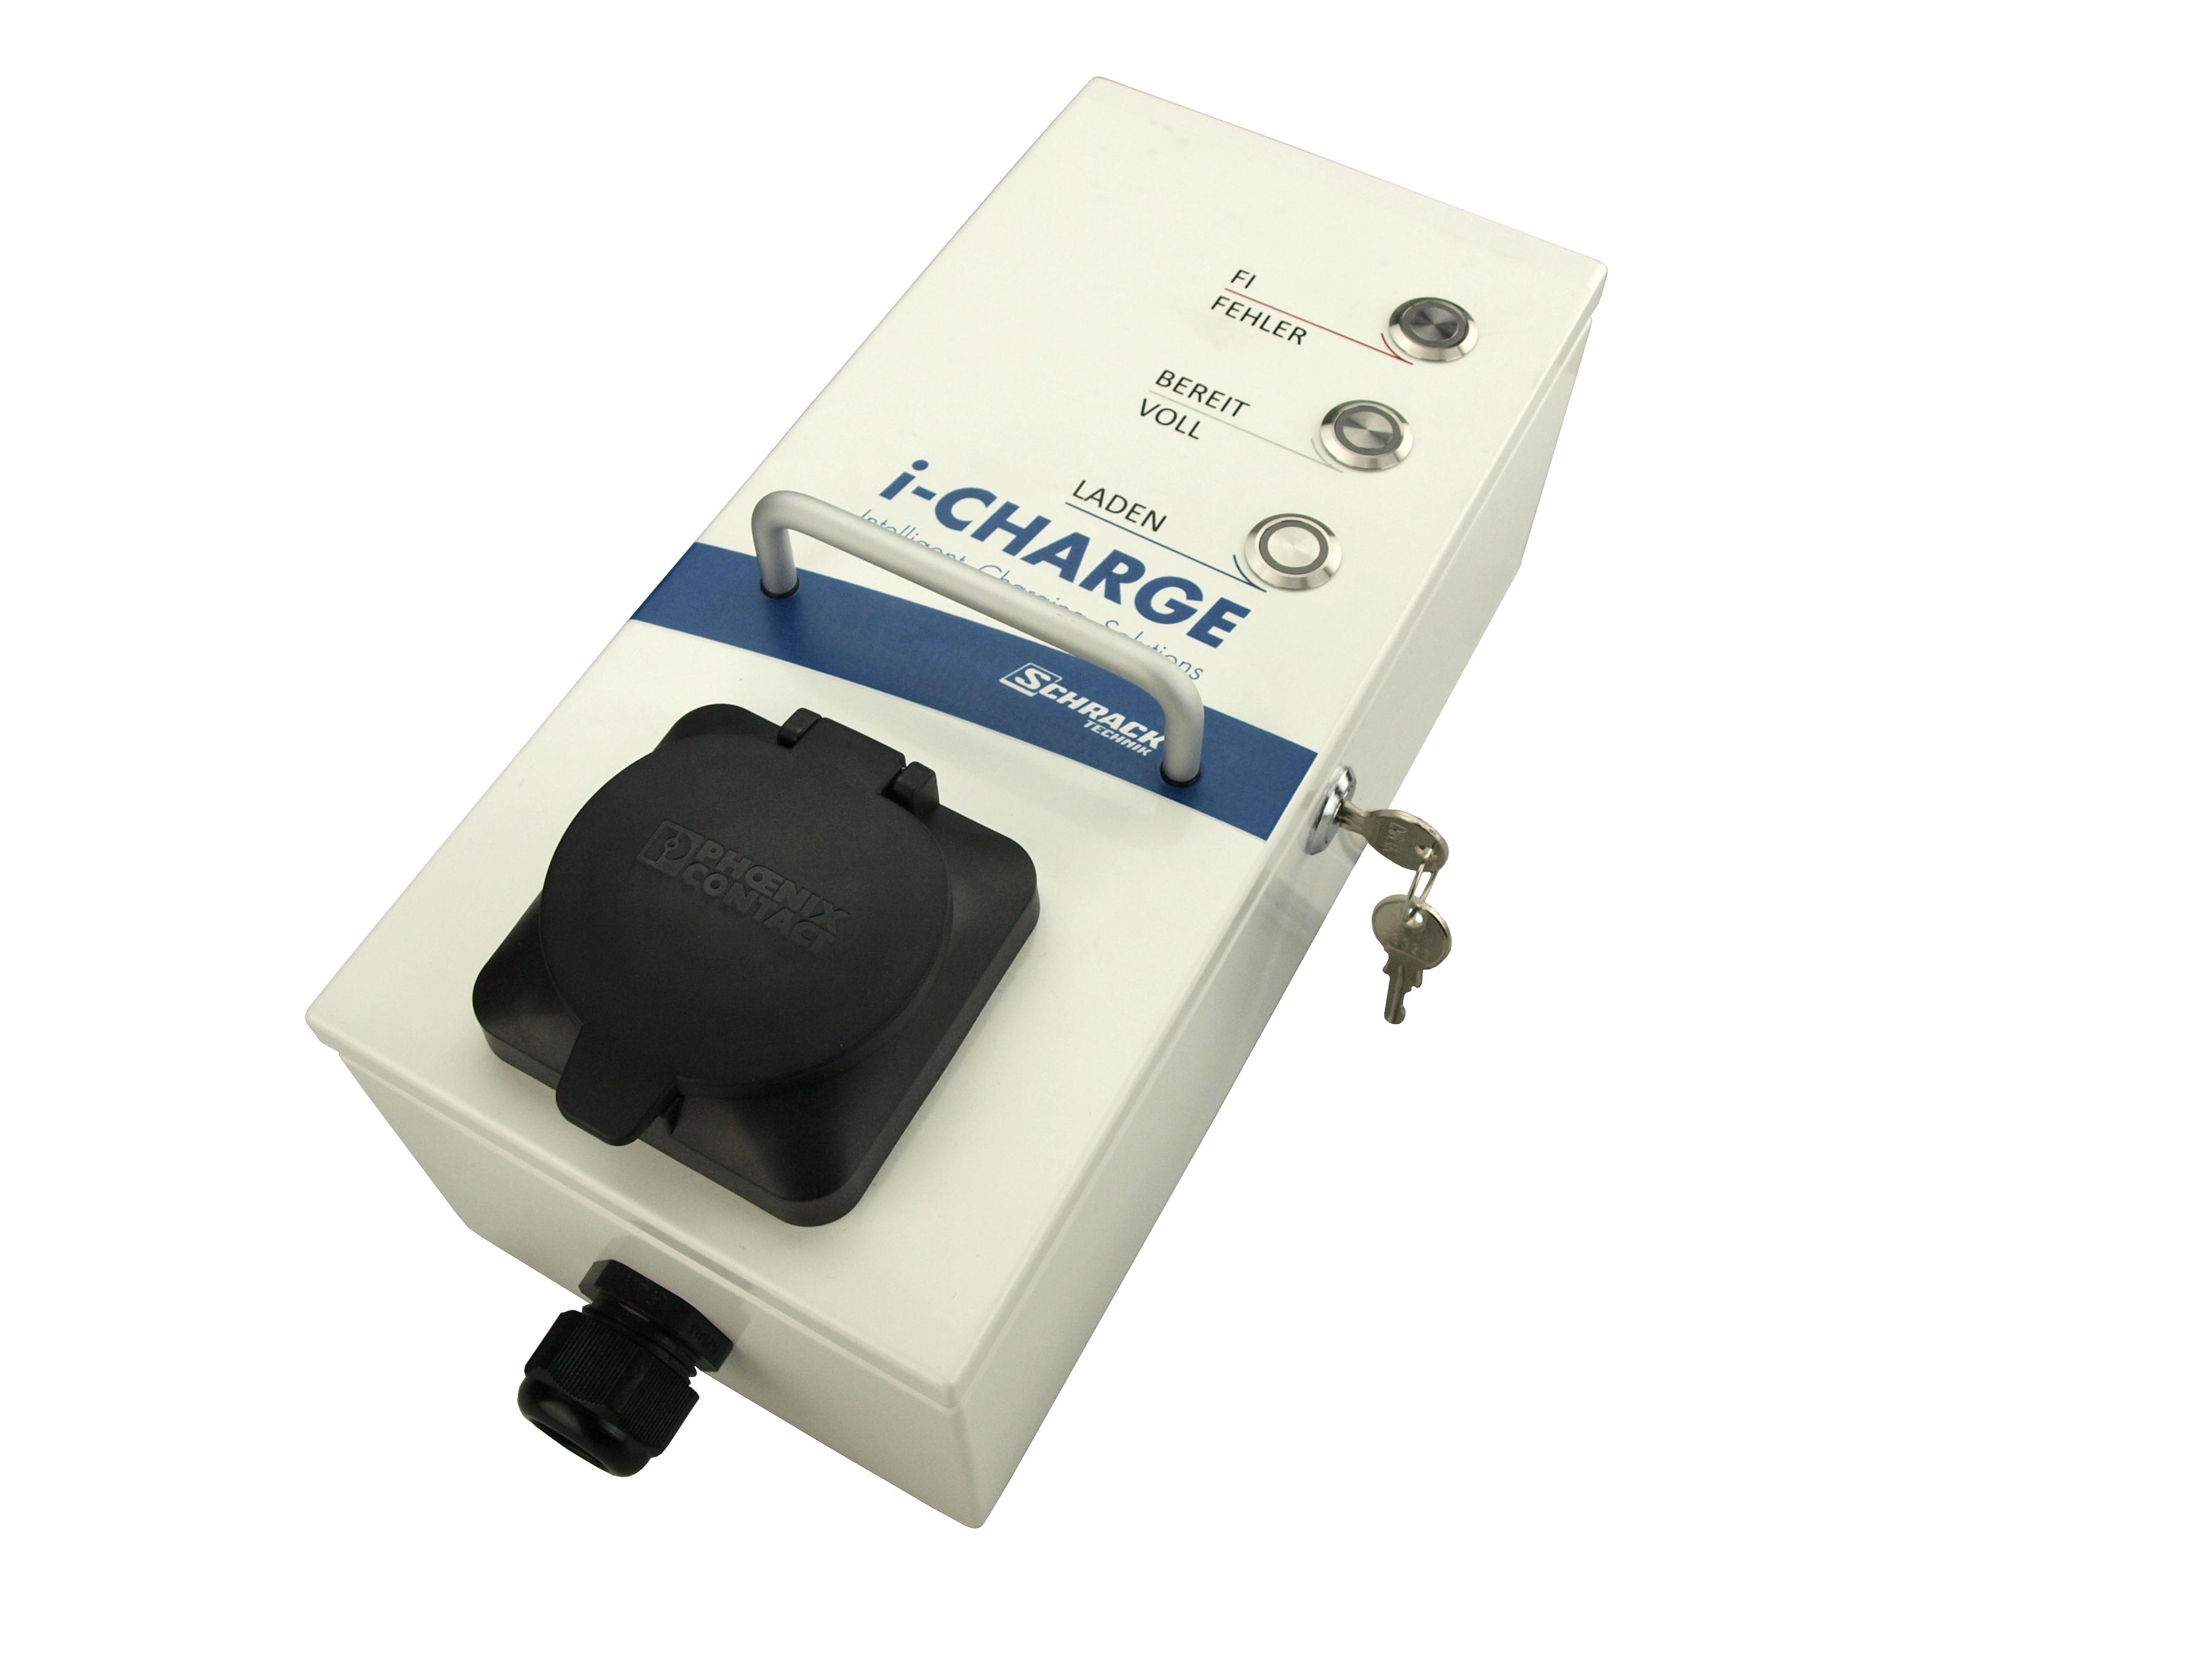 1 Stk i-CHARGE HOME Eco Typ2 11kW, allstromsensitiver FI EMHOM413B-